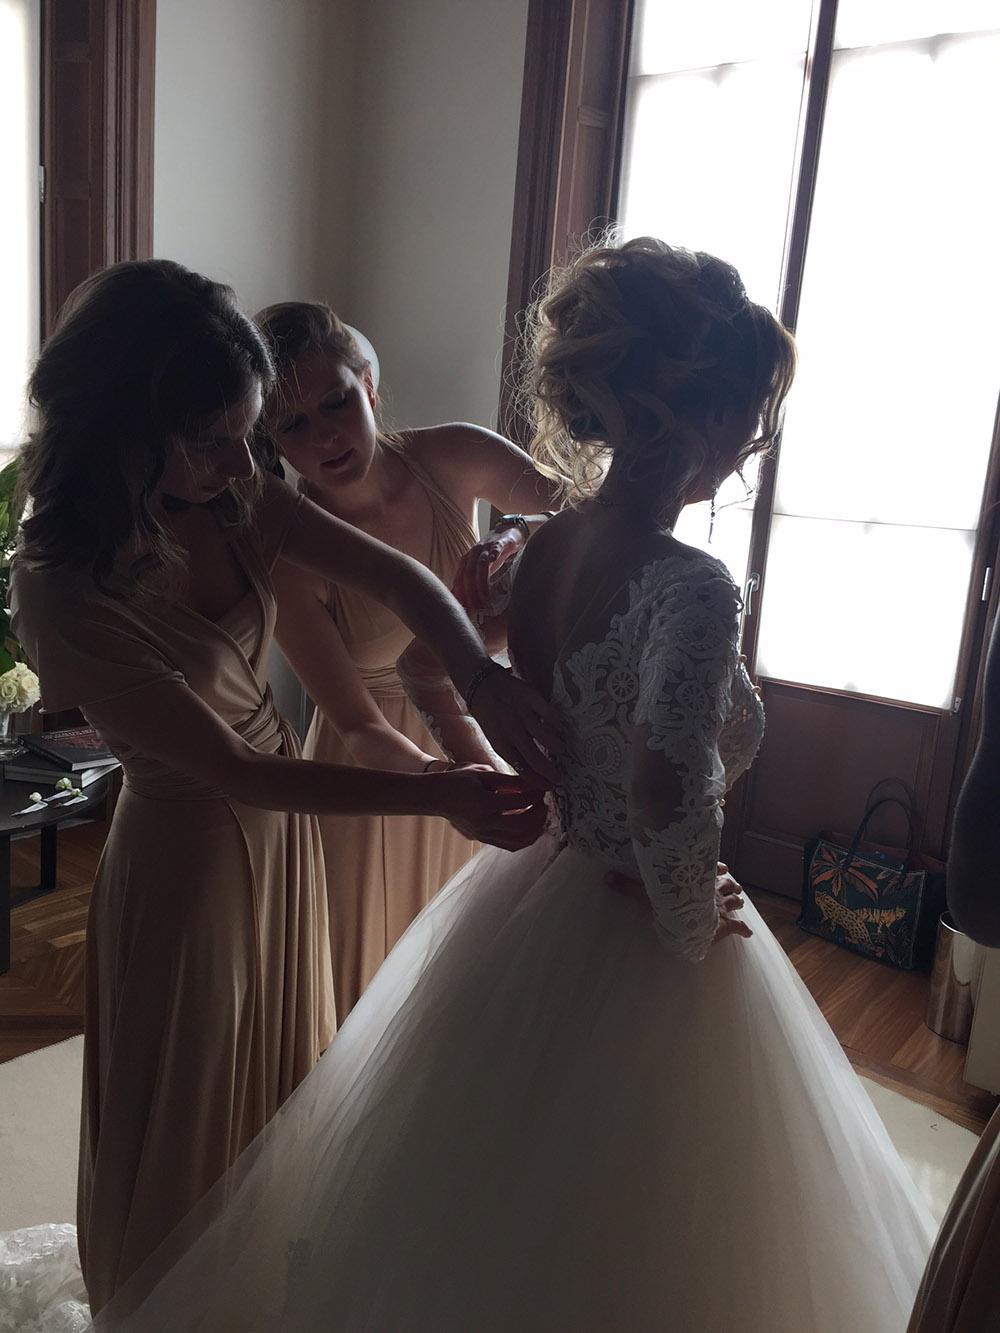 6-armenian-italian-wedding-in-rome-annartstyle-news.JPG